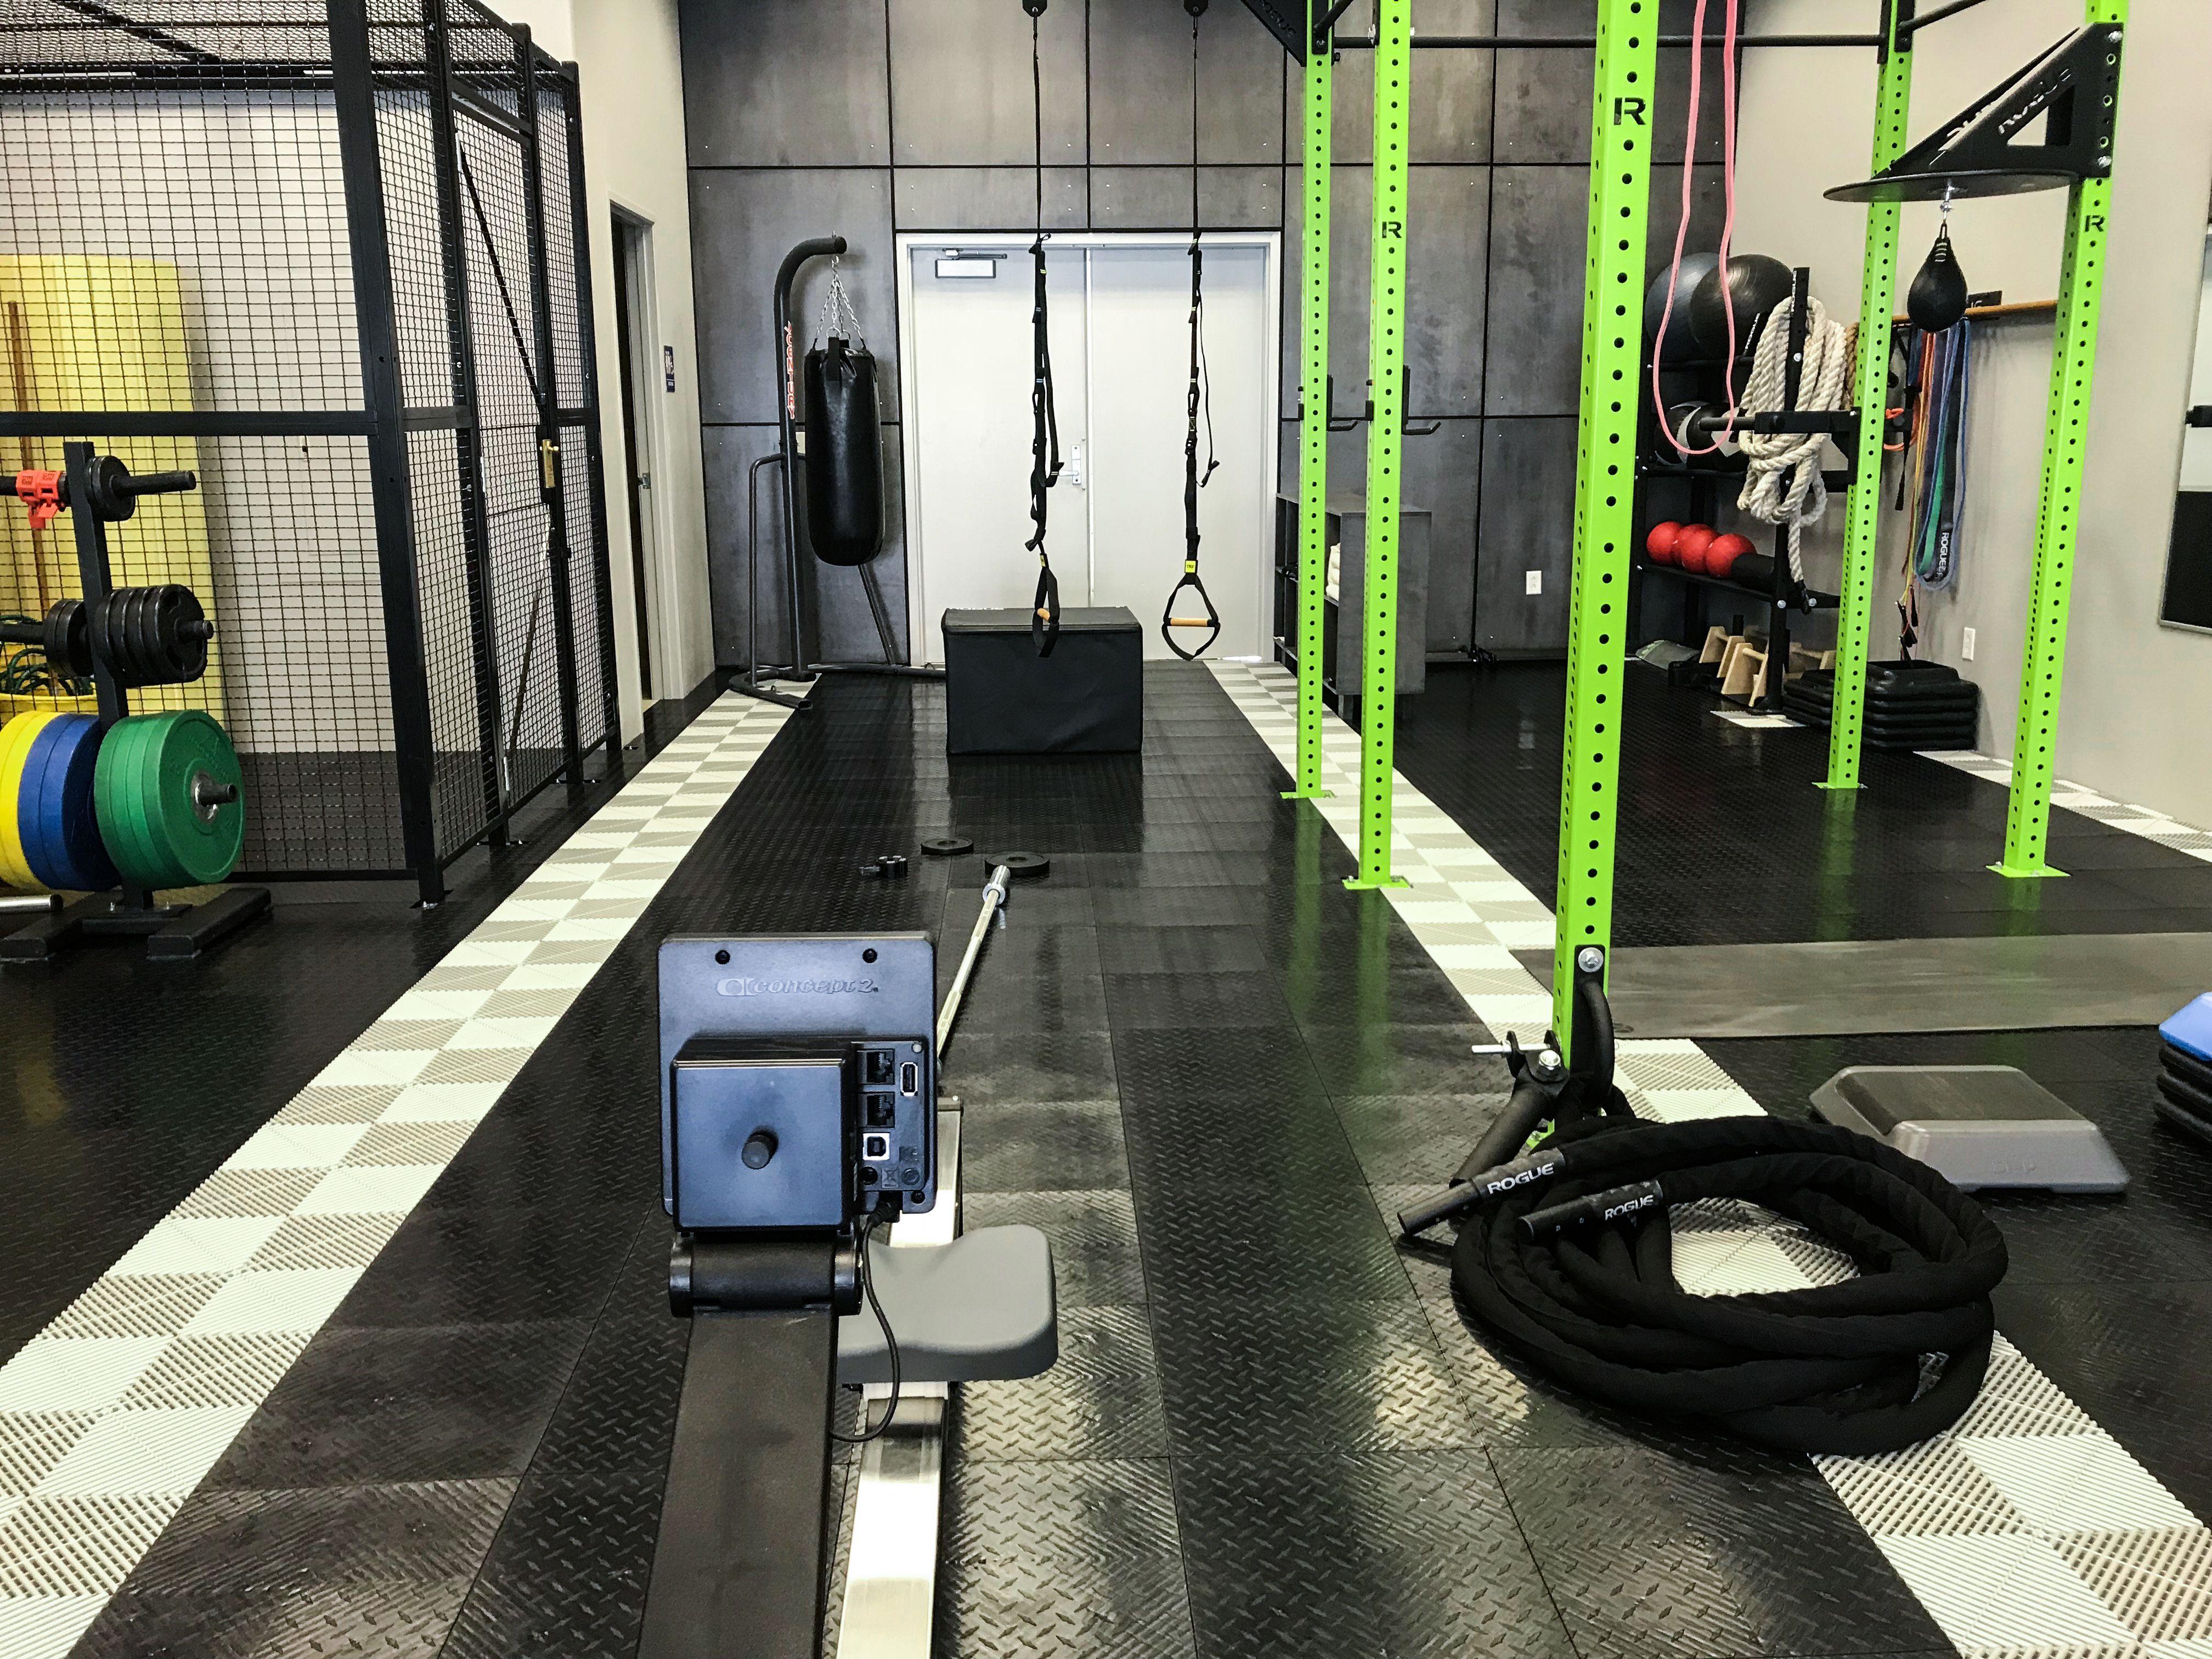 Gym Flooring Sports Flooring Tiles Transform Any Court Gym Or Studio Gym Flooring Tiles Gym Flooring Gym Flooring Rubber